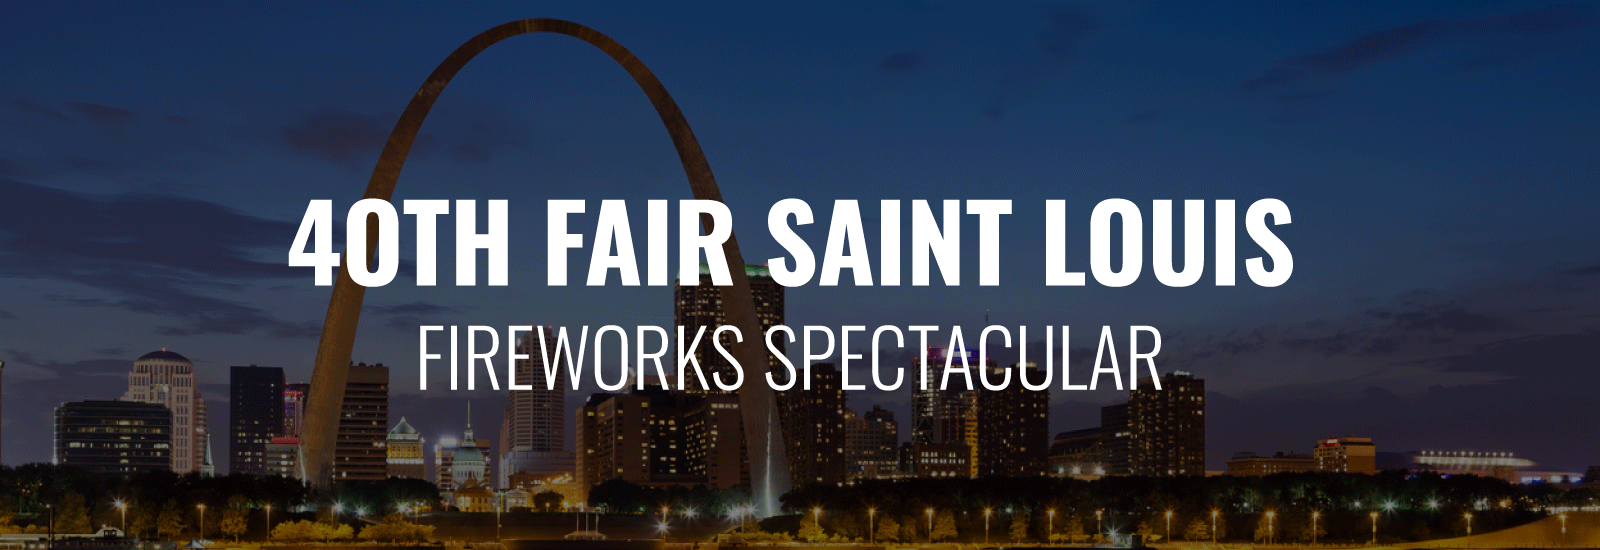 40th Fair Saint Louis' Fourth of July Fireworks Spectacular